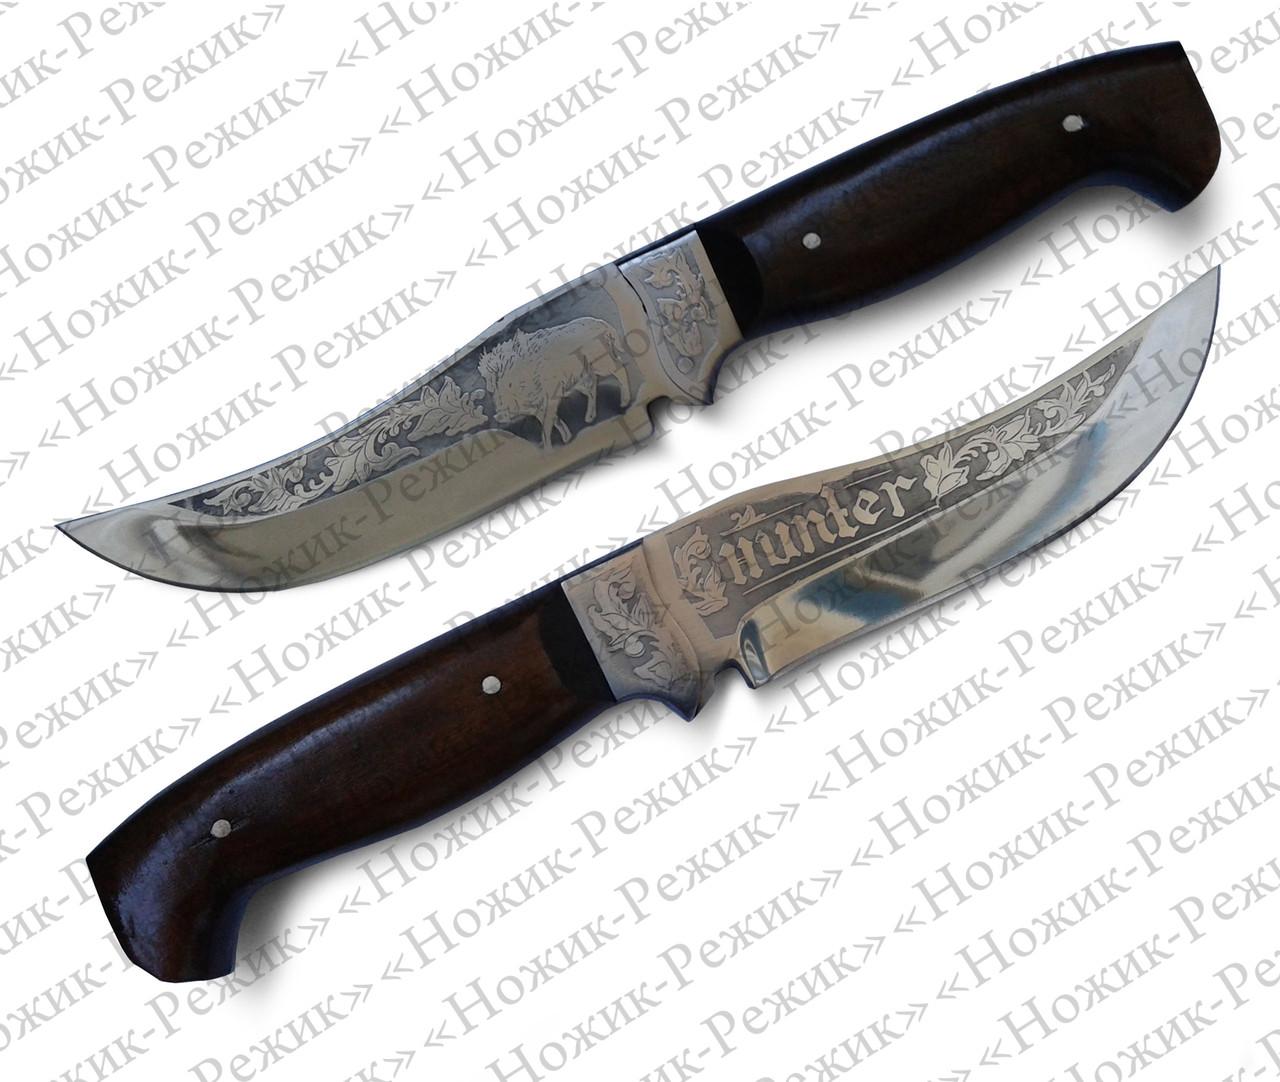 Нож туристический, охотничий нож, рыбацкий нож, нож АТО, тактический нож, боевой нож